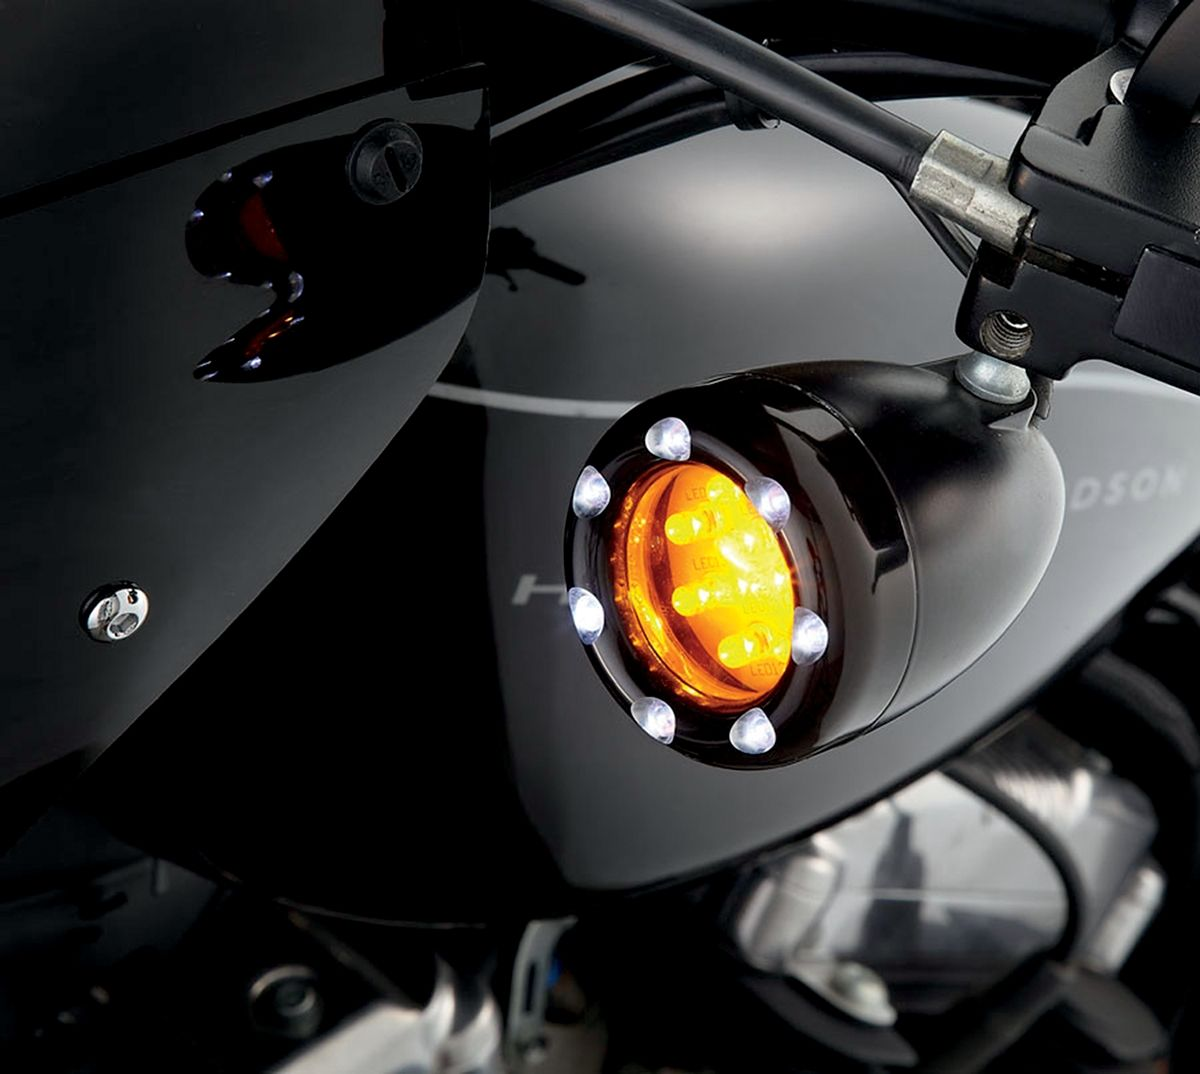 【ARLEN NESS】LED 方向燈 BLK WH [2040-0848] - 「Webike-摩托百貨」